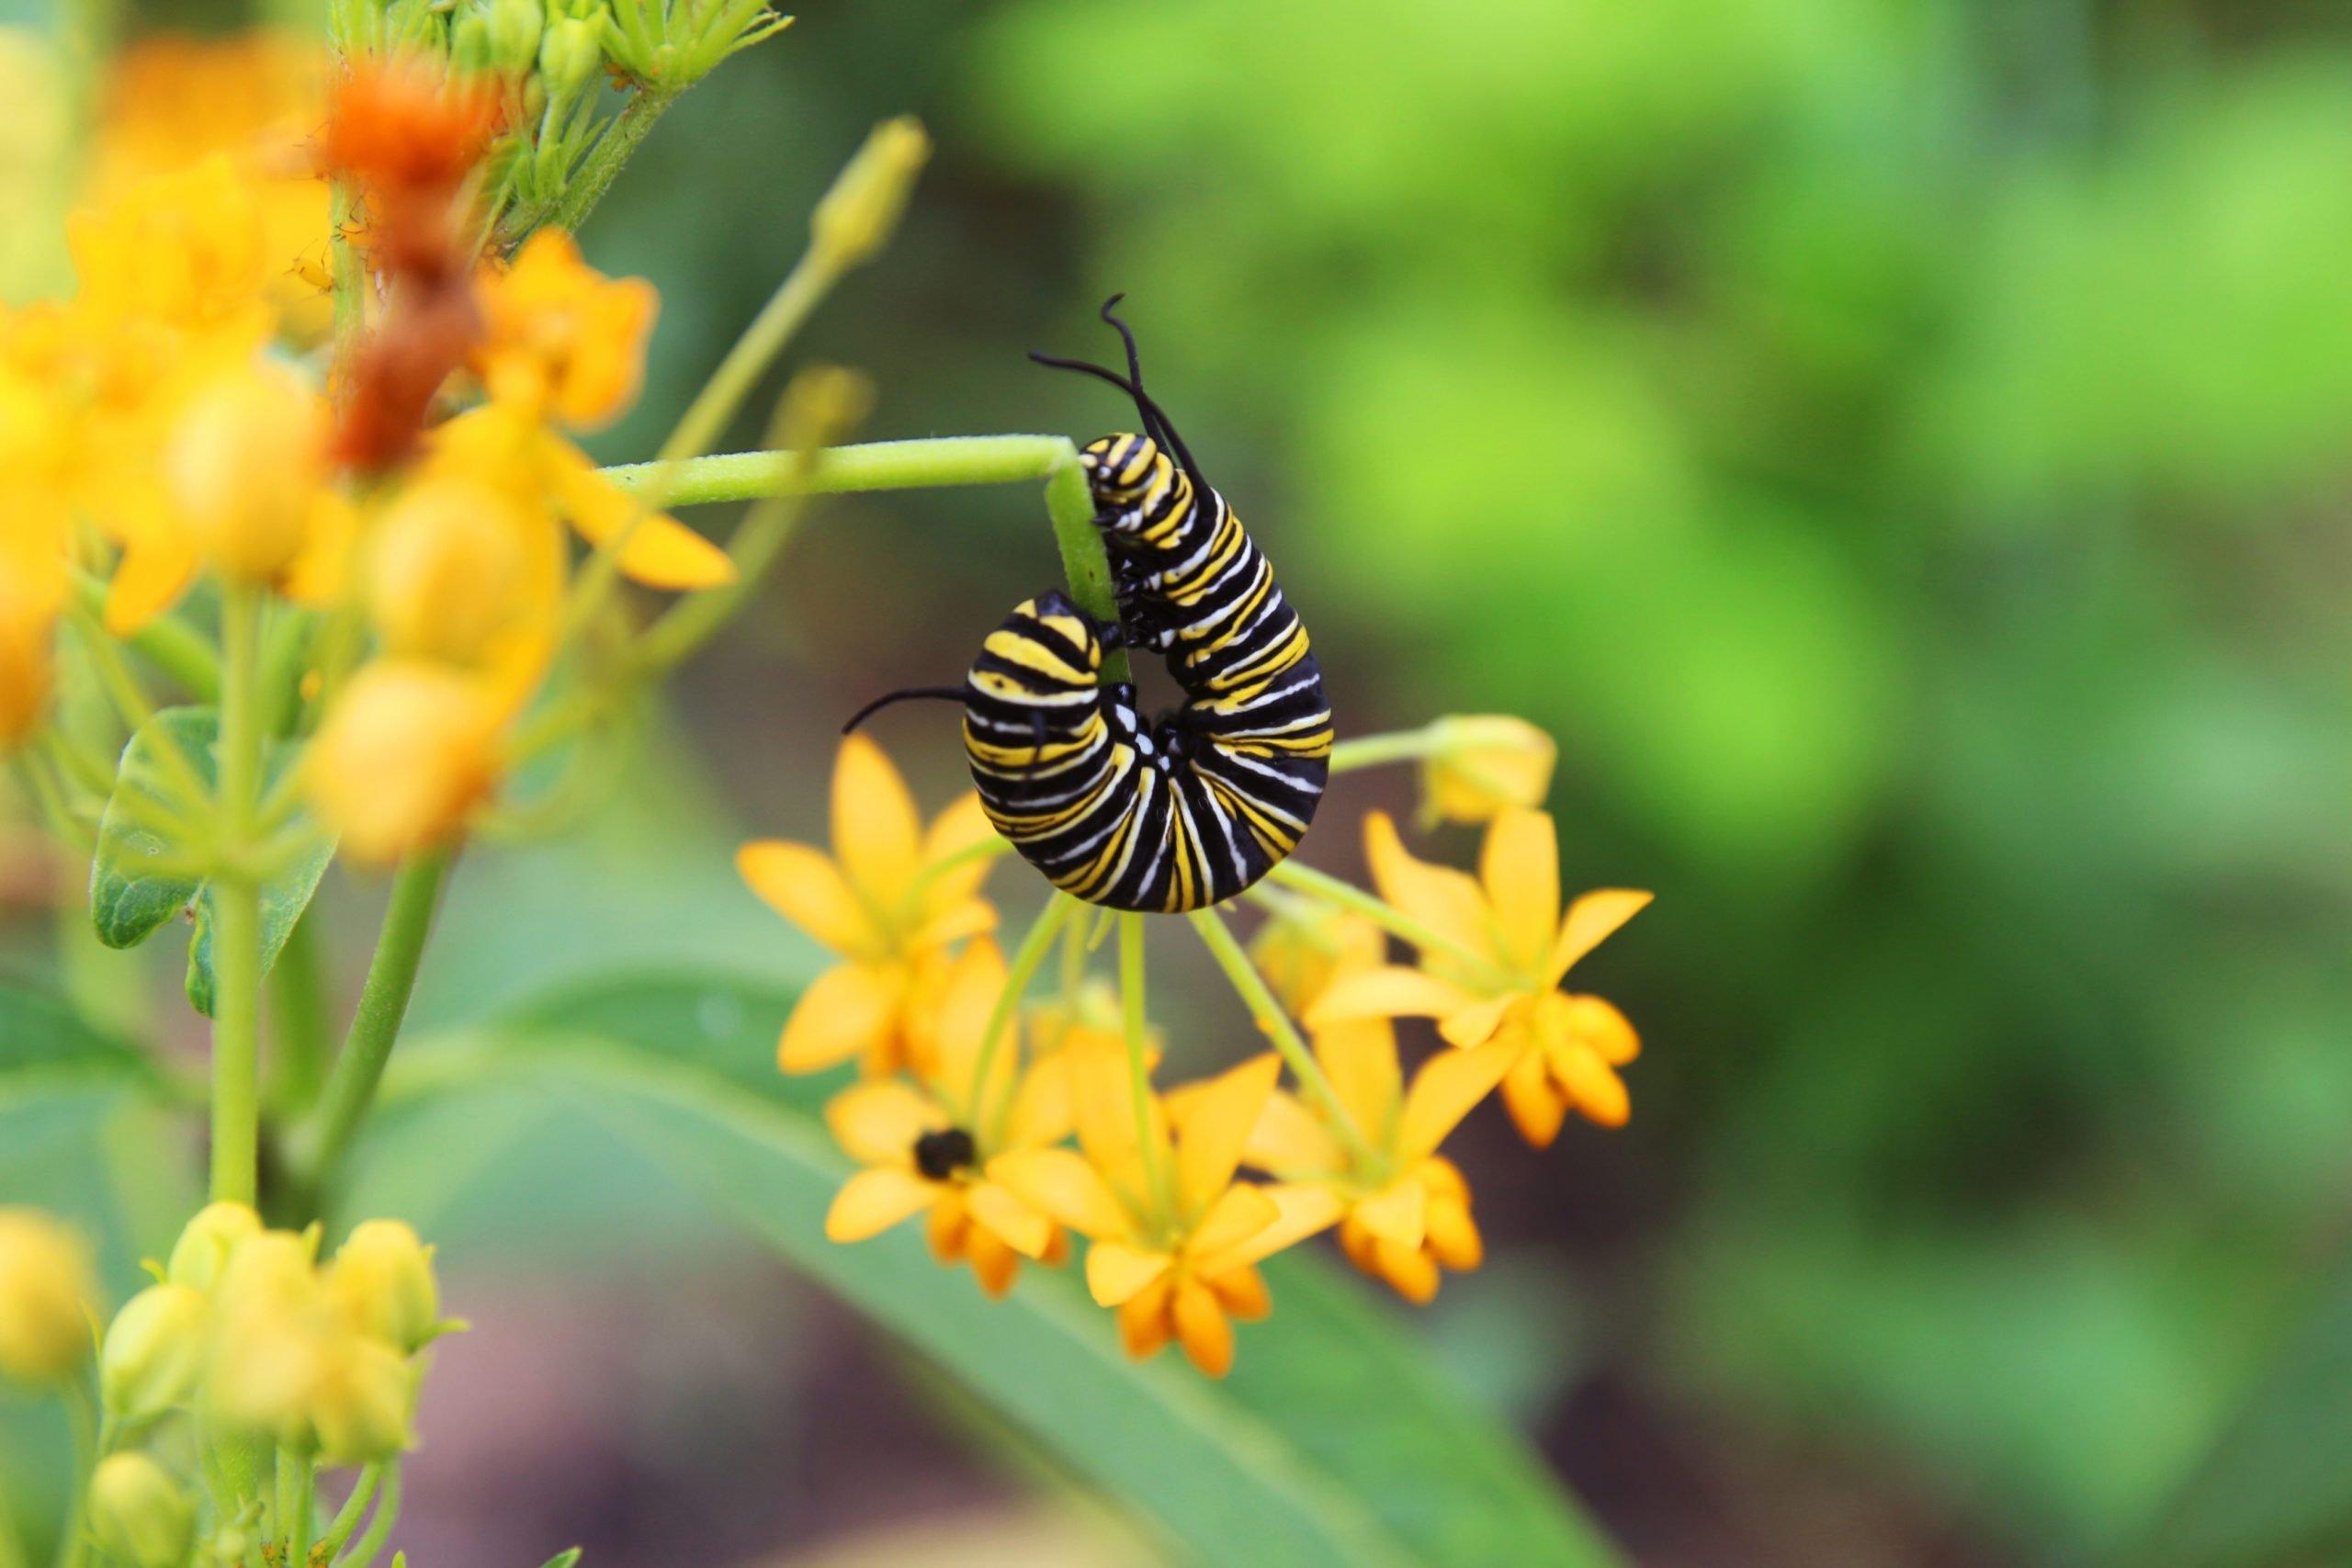 A monarch caterpillar bends around a milkweed plant.